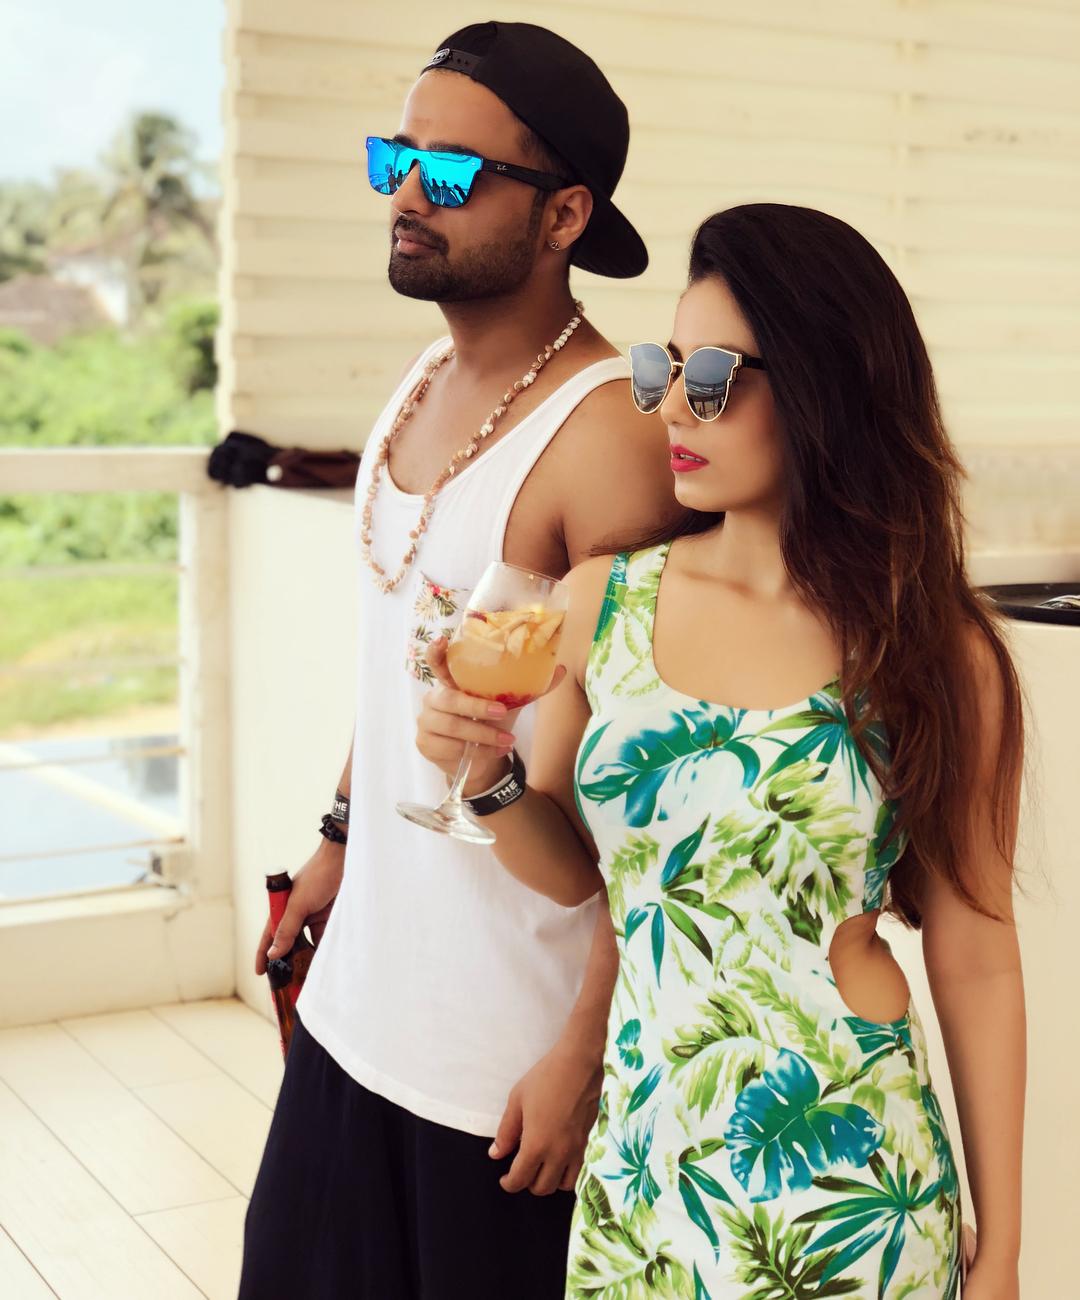 Bollywood Tadka,सृष्टि रोडे इमेज,मनीष नागदेव इमेज, सगाई इमेज,